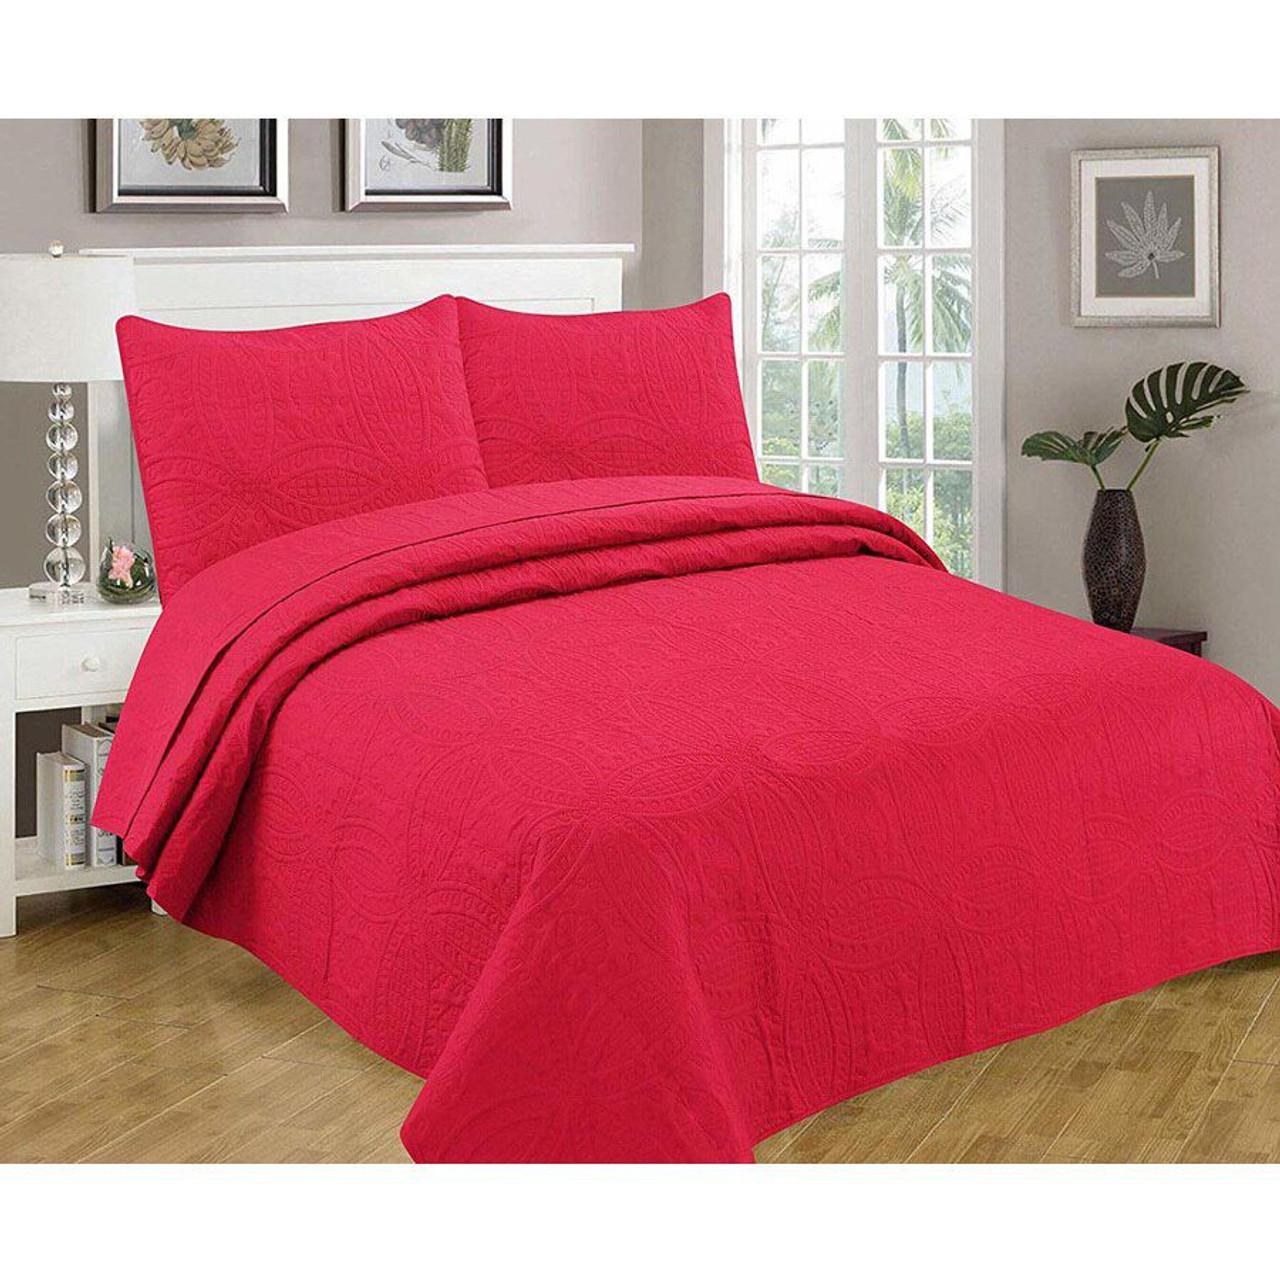 3 pcs Oversized Bedspread Coverlet Set Paradise Pink Color